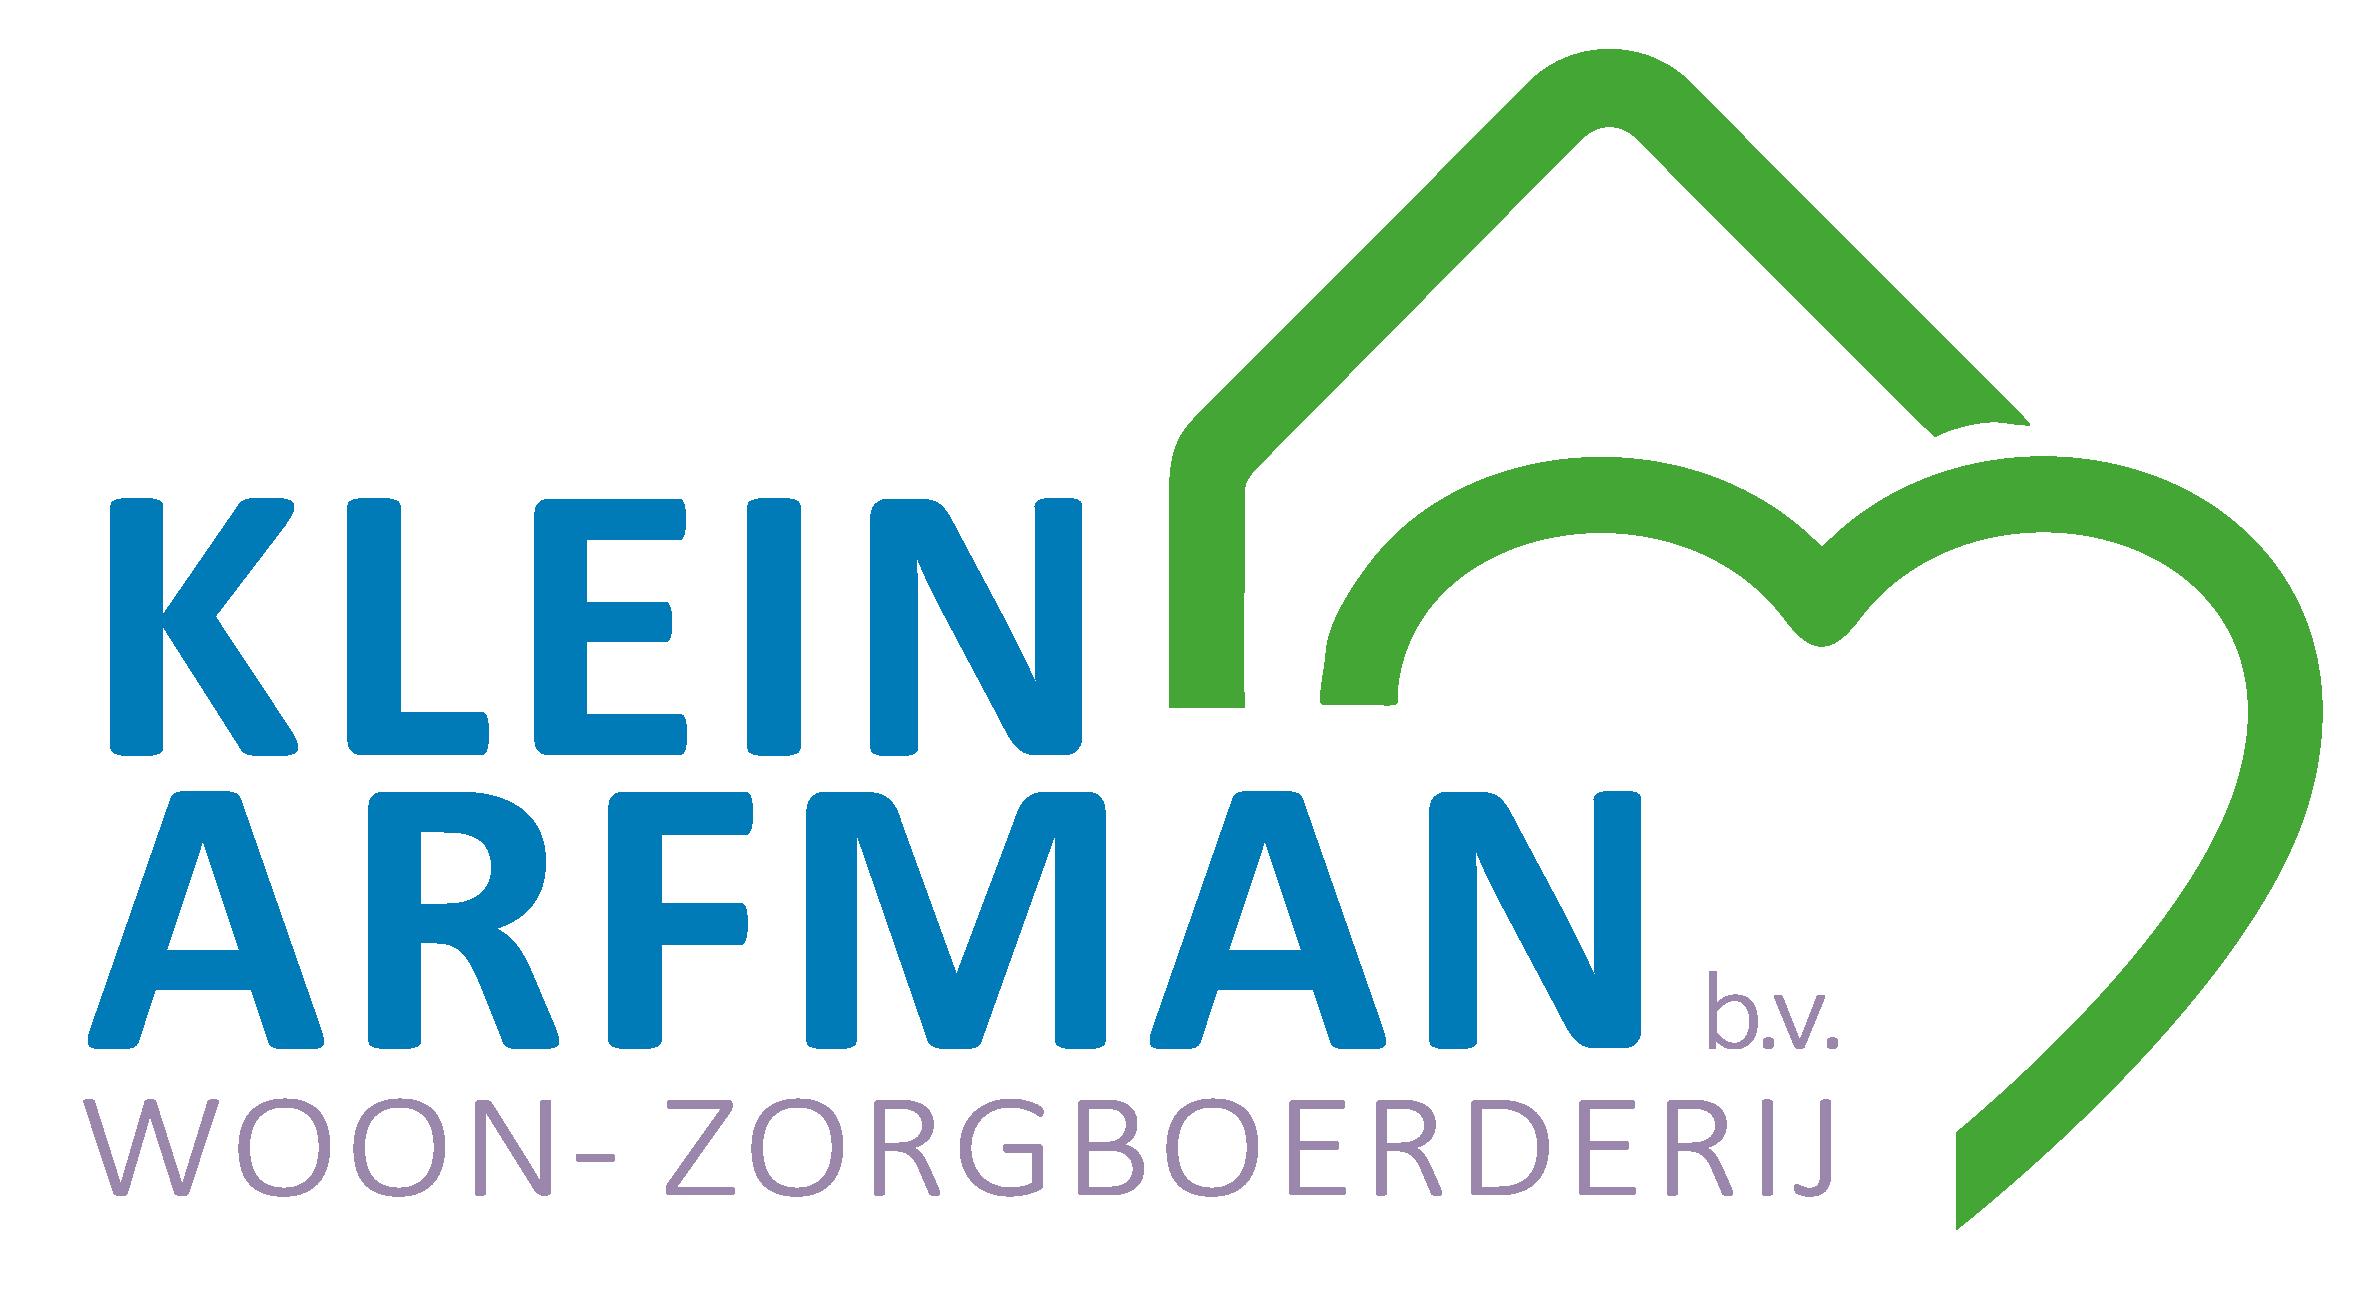 Klein Arfman